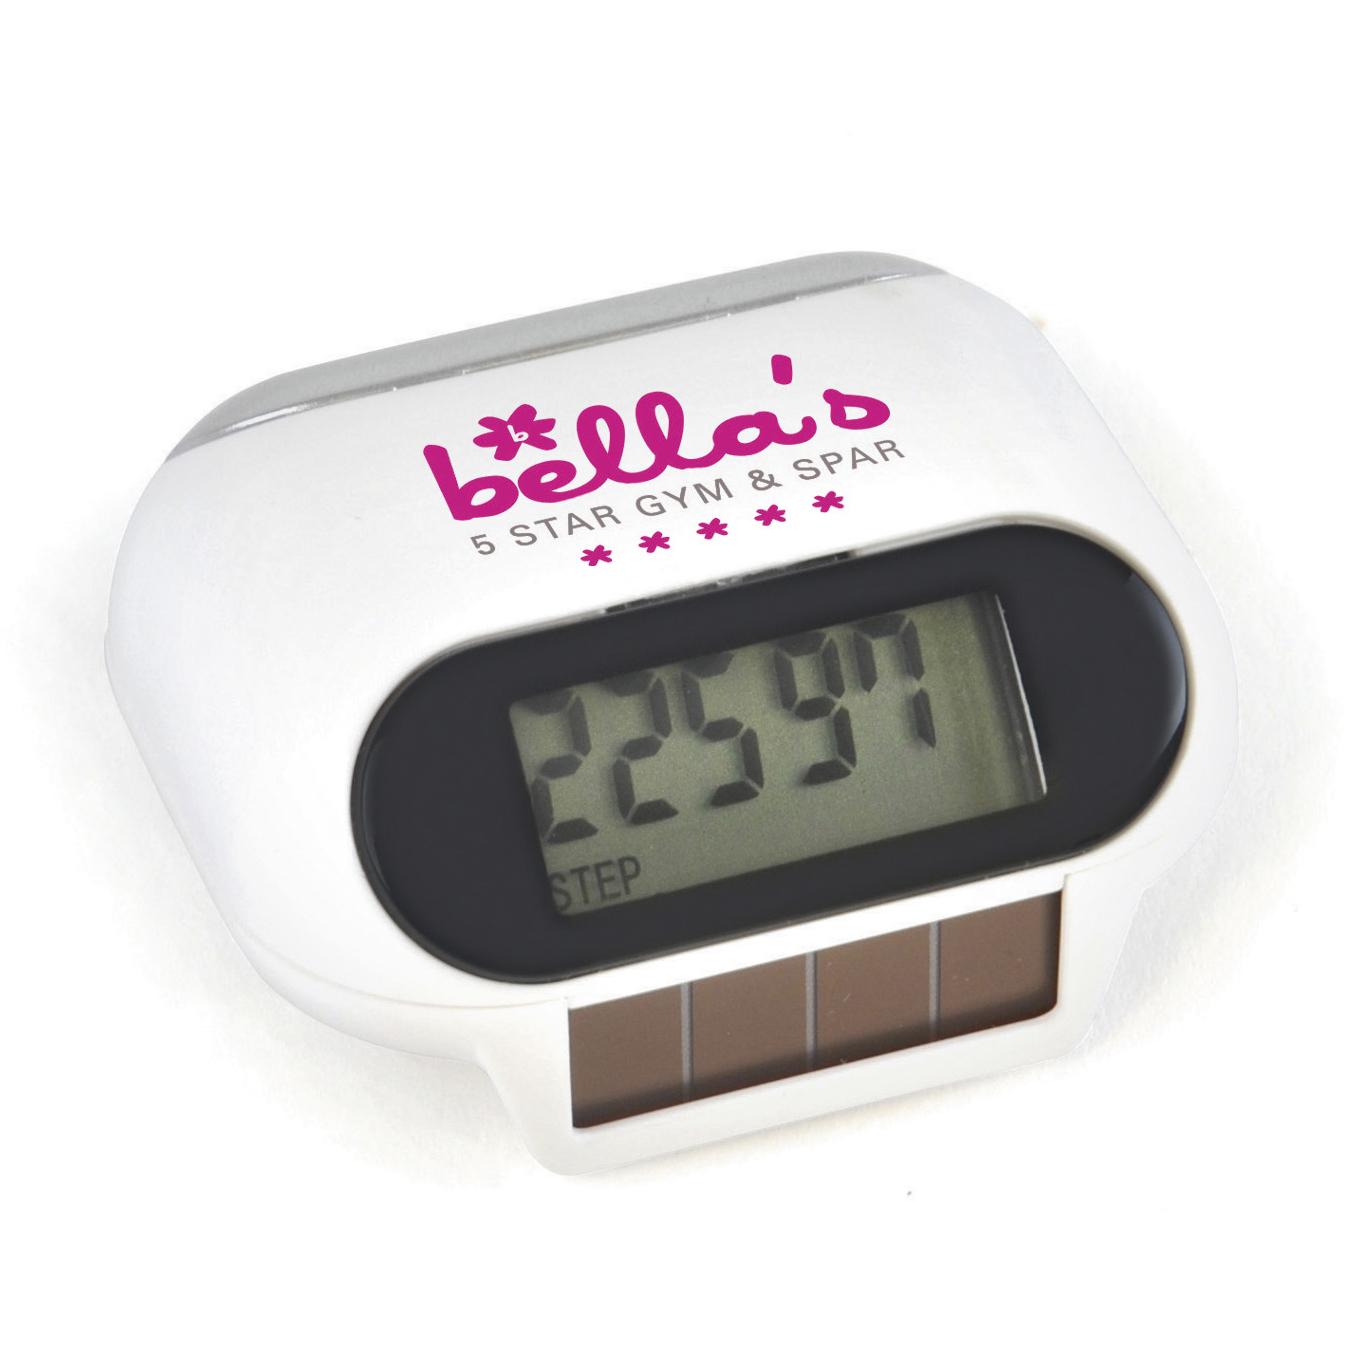 Promotional Mishnock Solar Pedometer